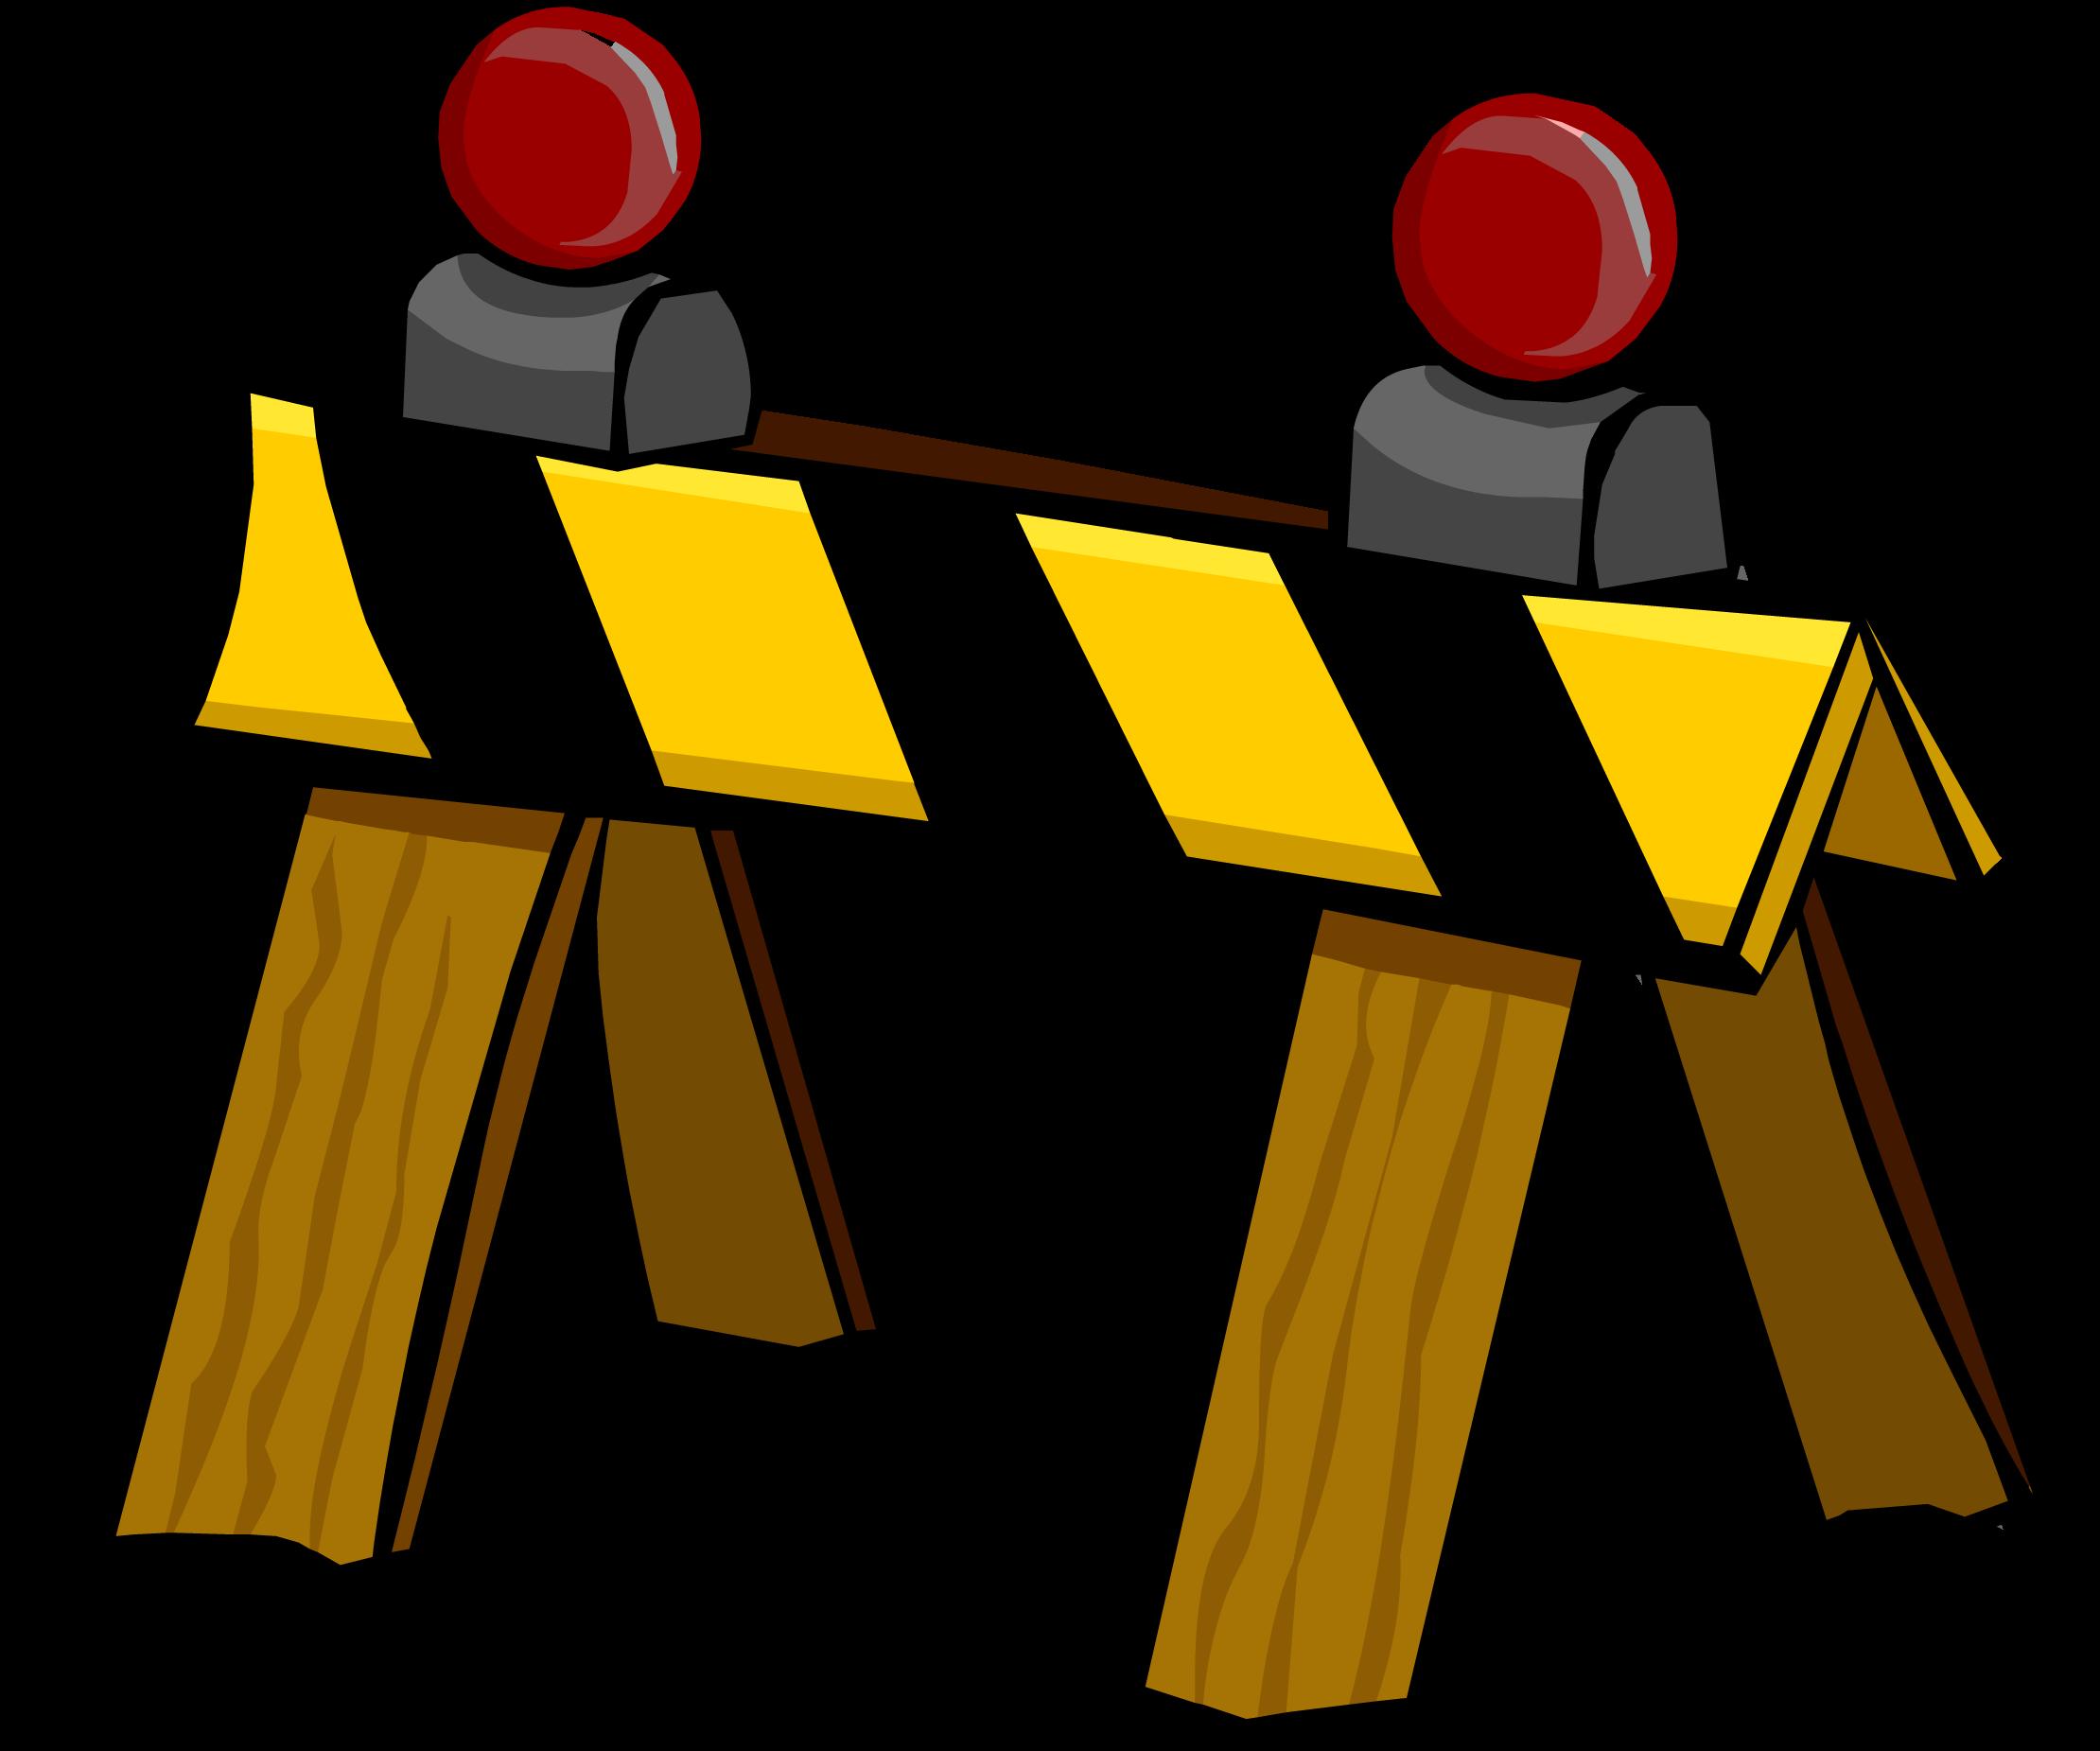 Construction Barrier